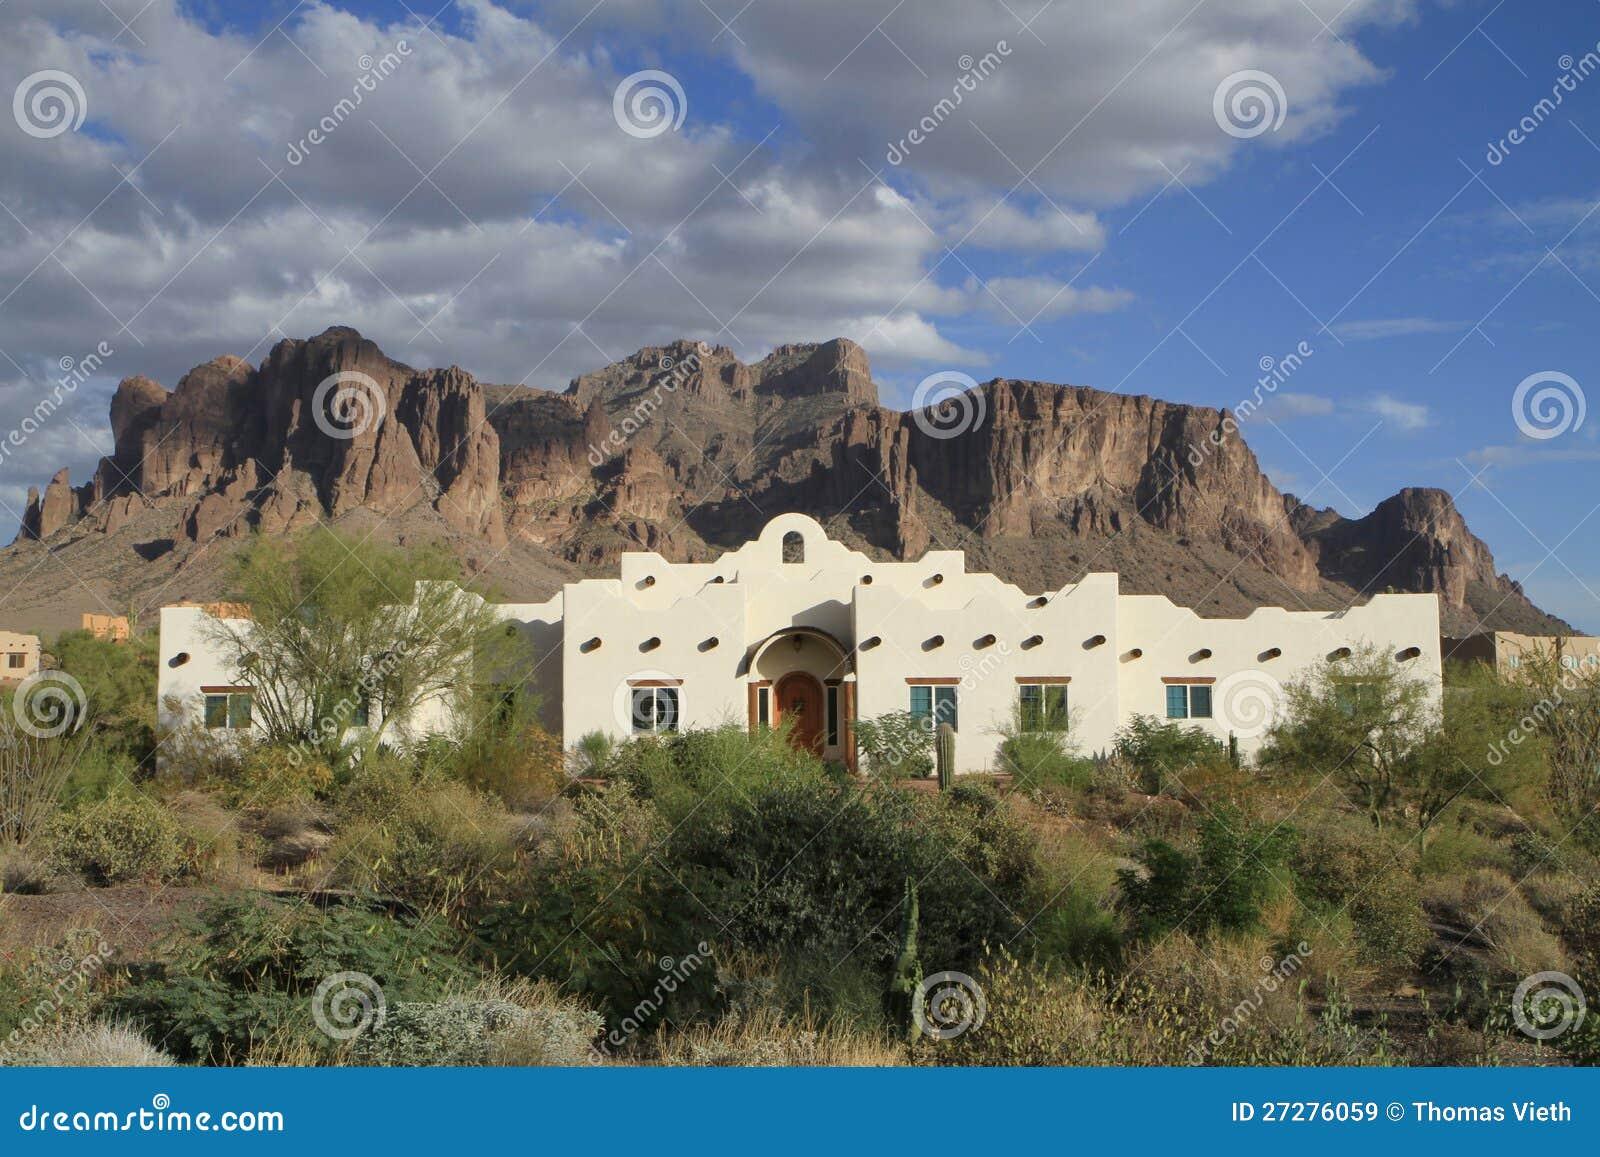 Usa Arizona Sonoran Desert Mission Revival Adobe Royalty